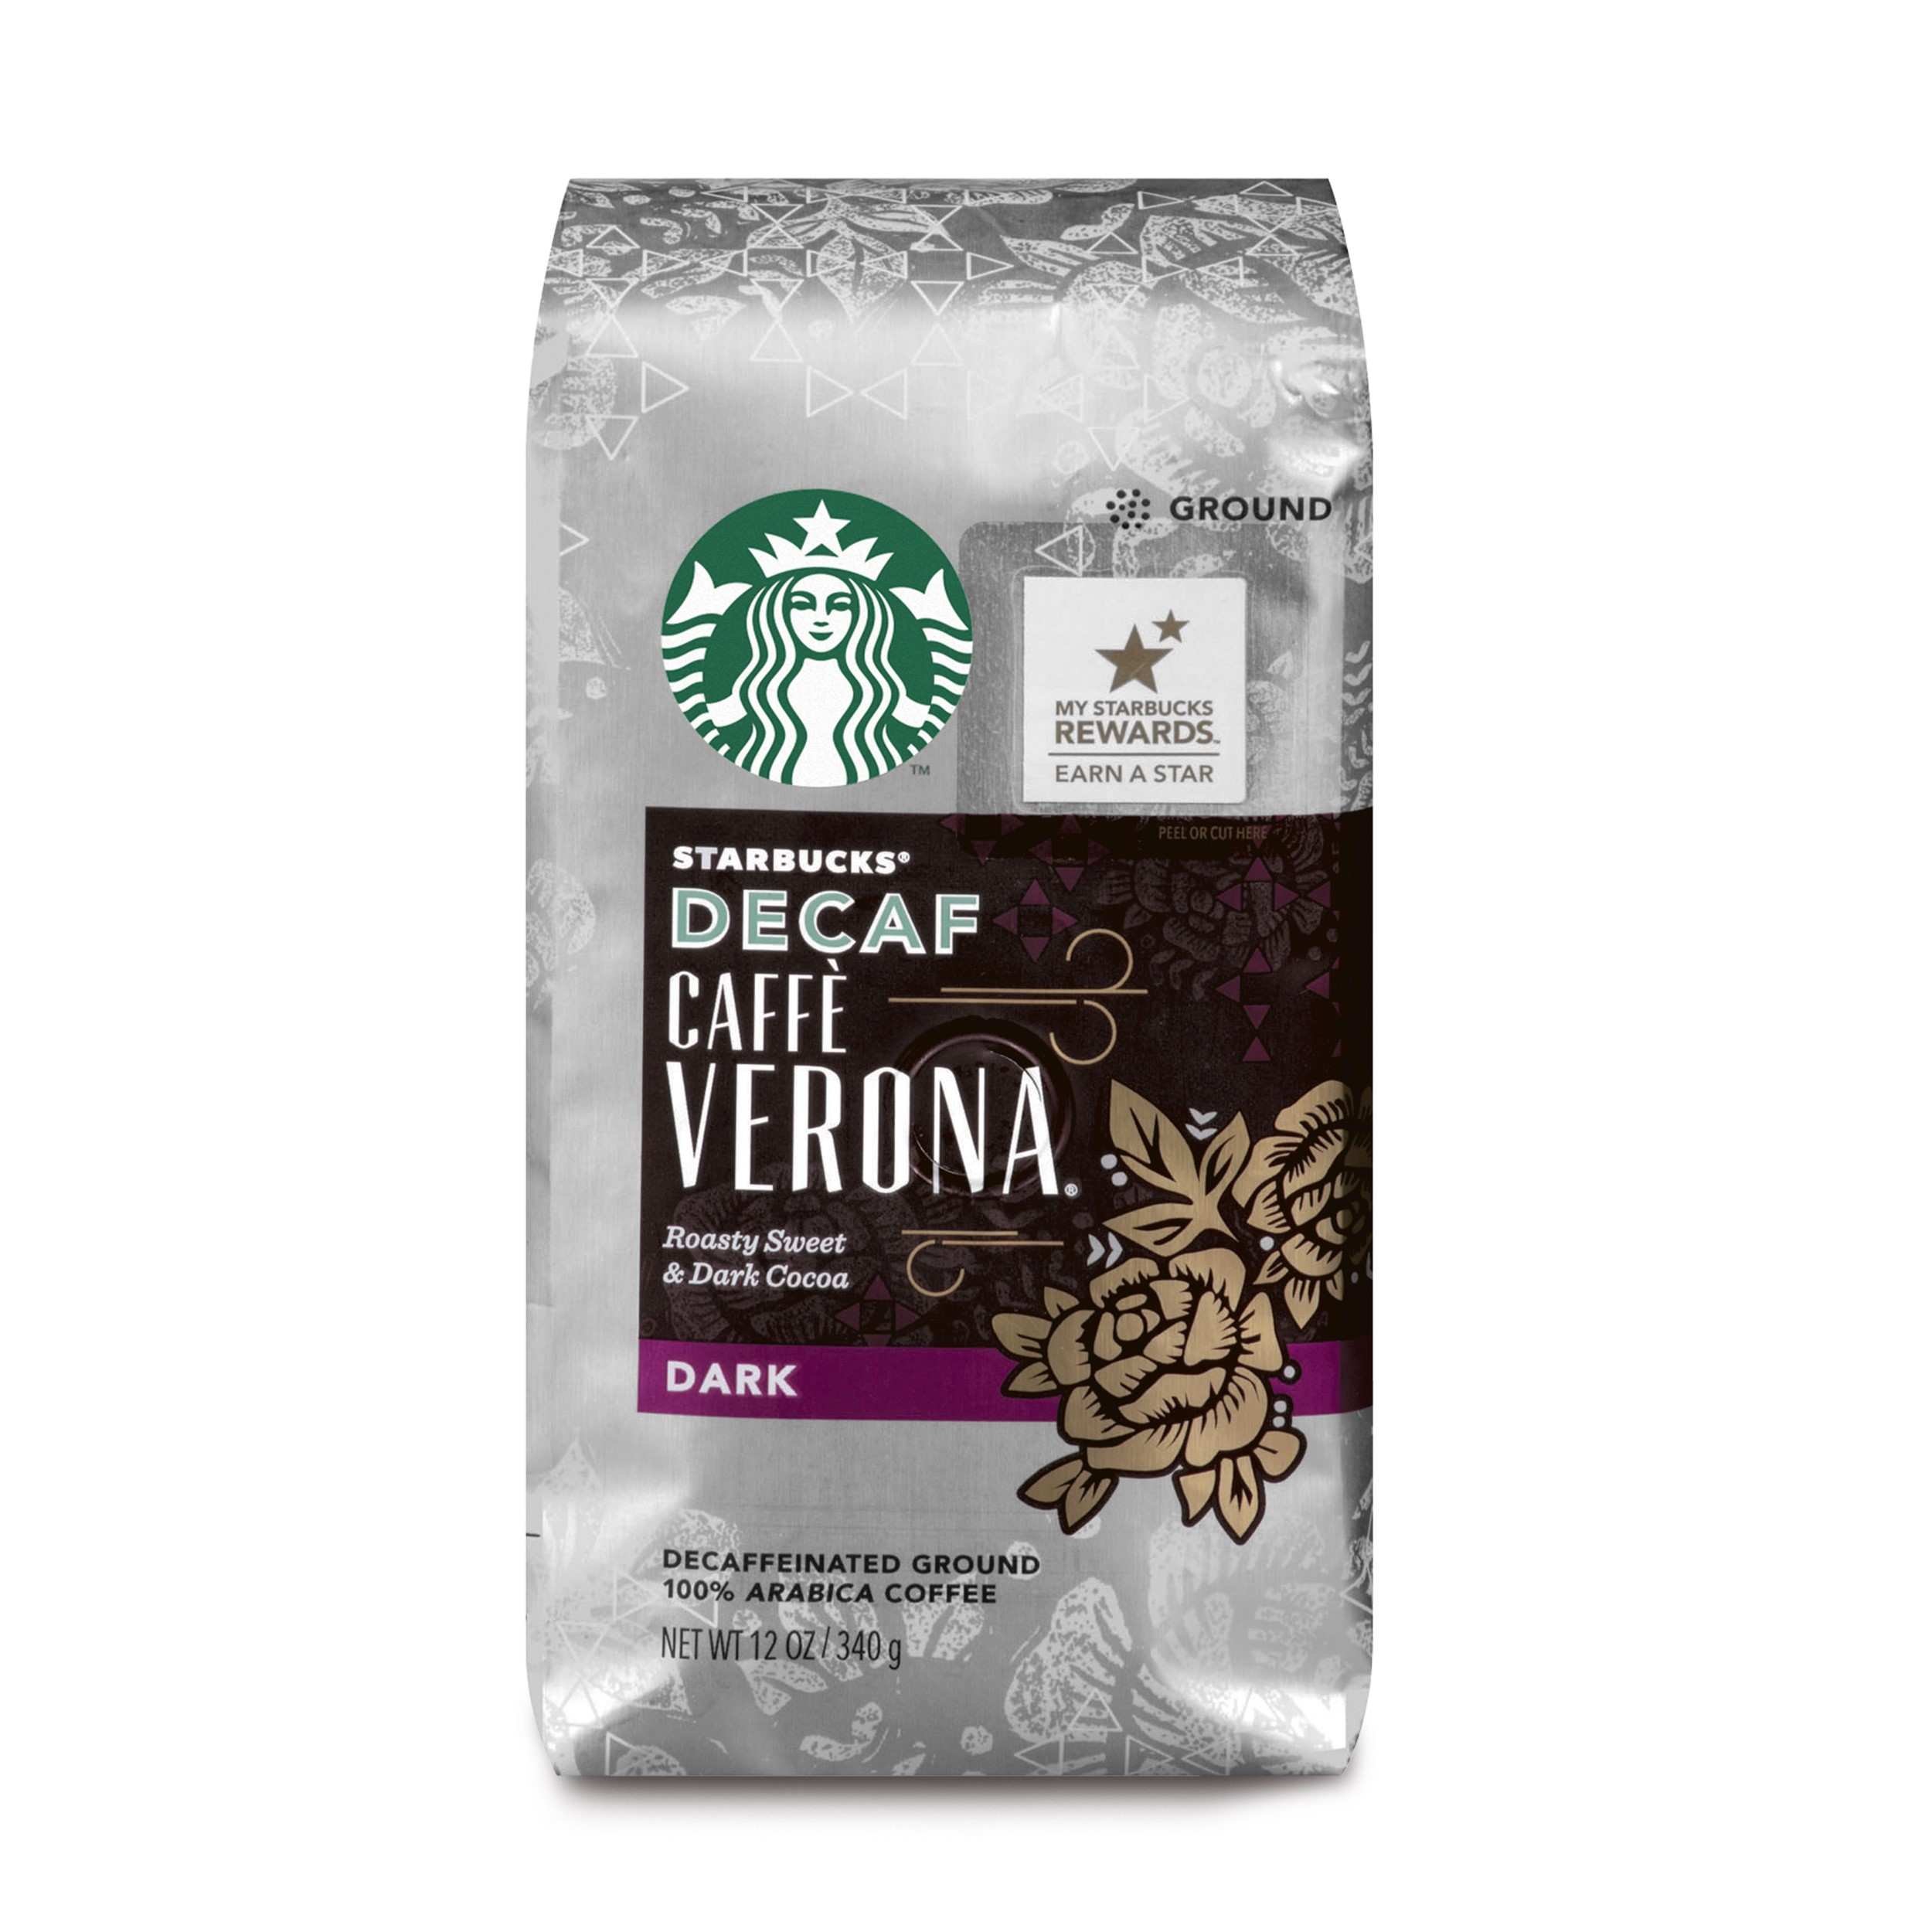 Enjoyable Starbucks Decaf Ground Coffee Verona 12 Oz Walmart Com Machost Co Dining Chair Design Ideas Machostcouk